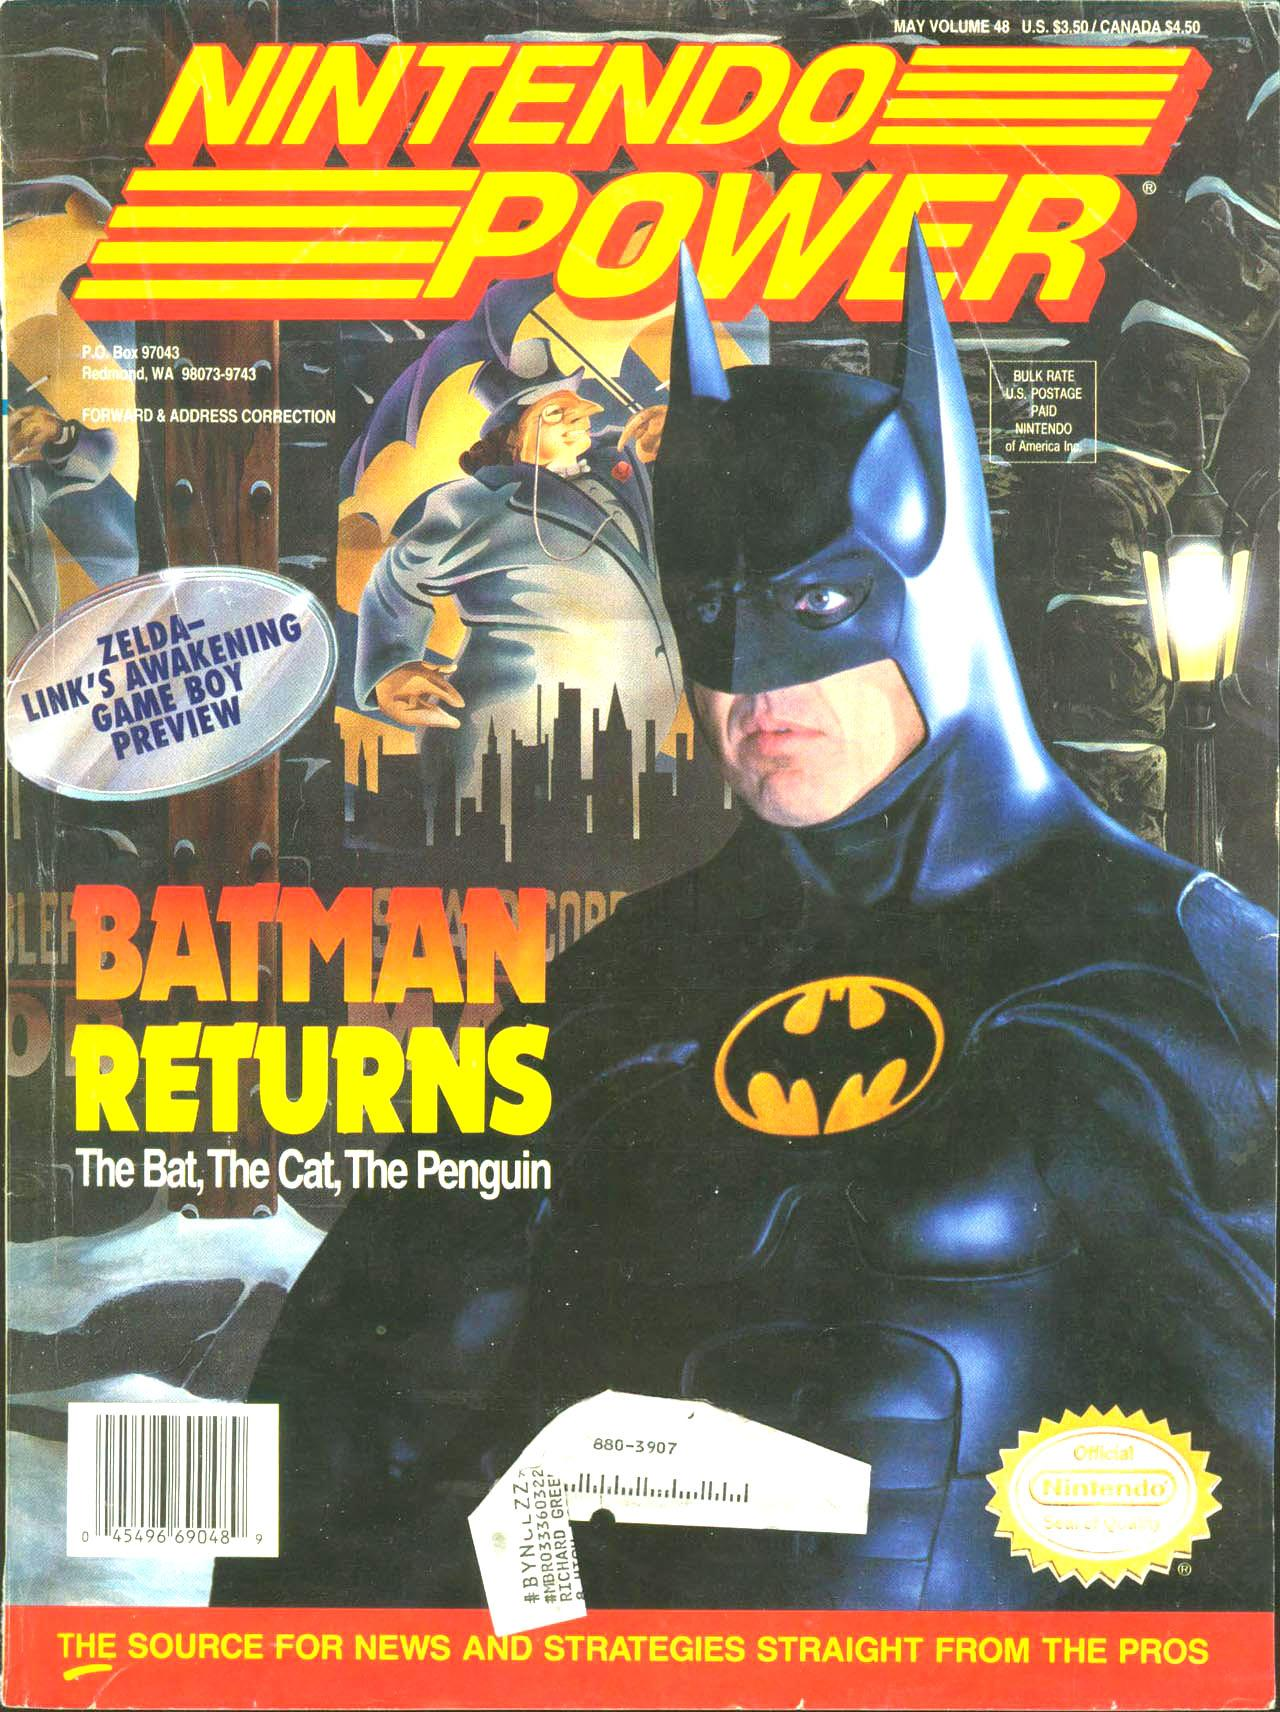 Where I Read Nintendo Power 48 Breaking It All Down